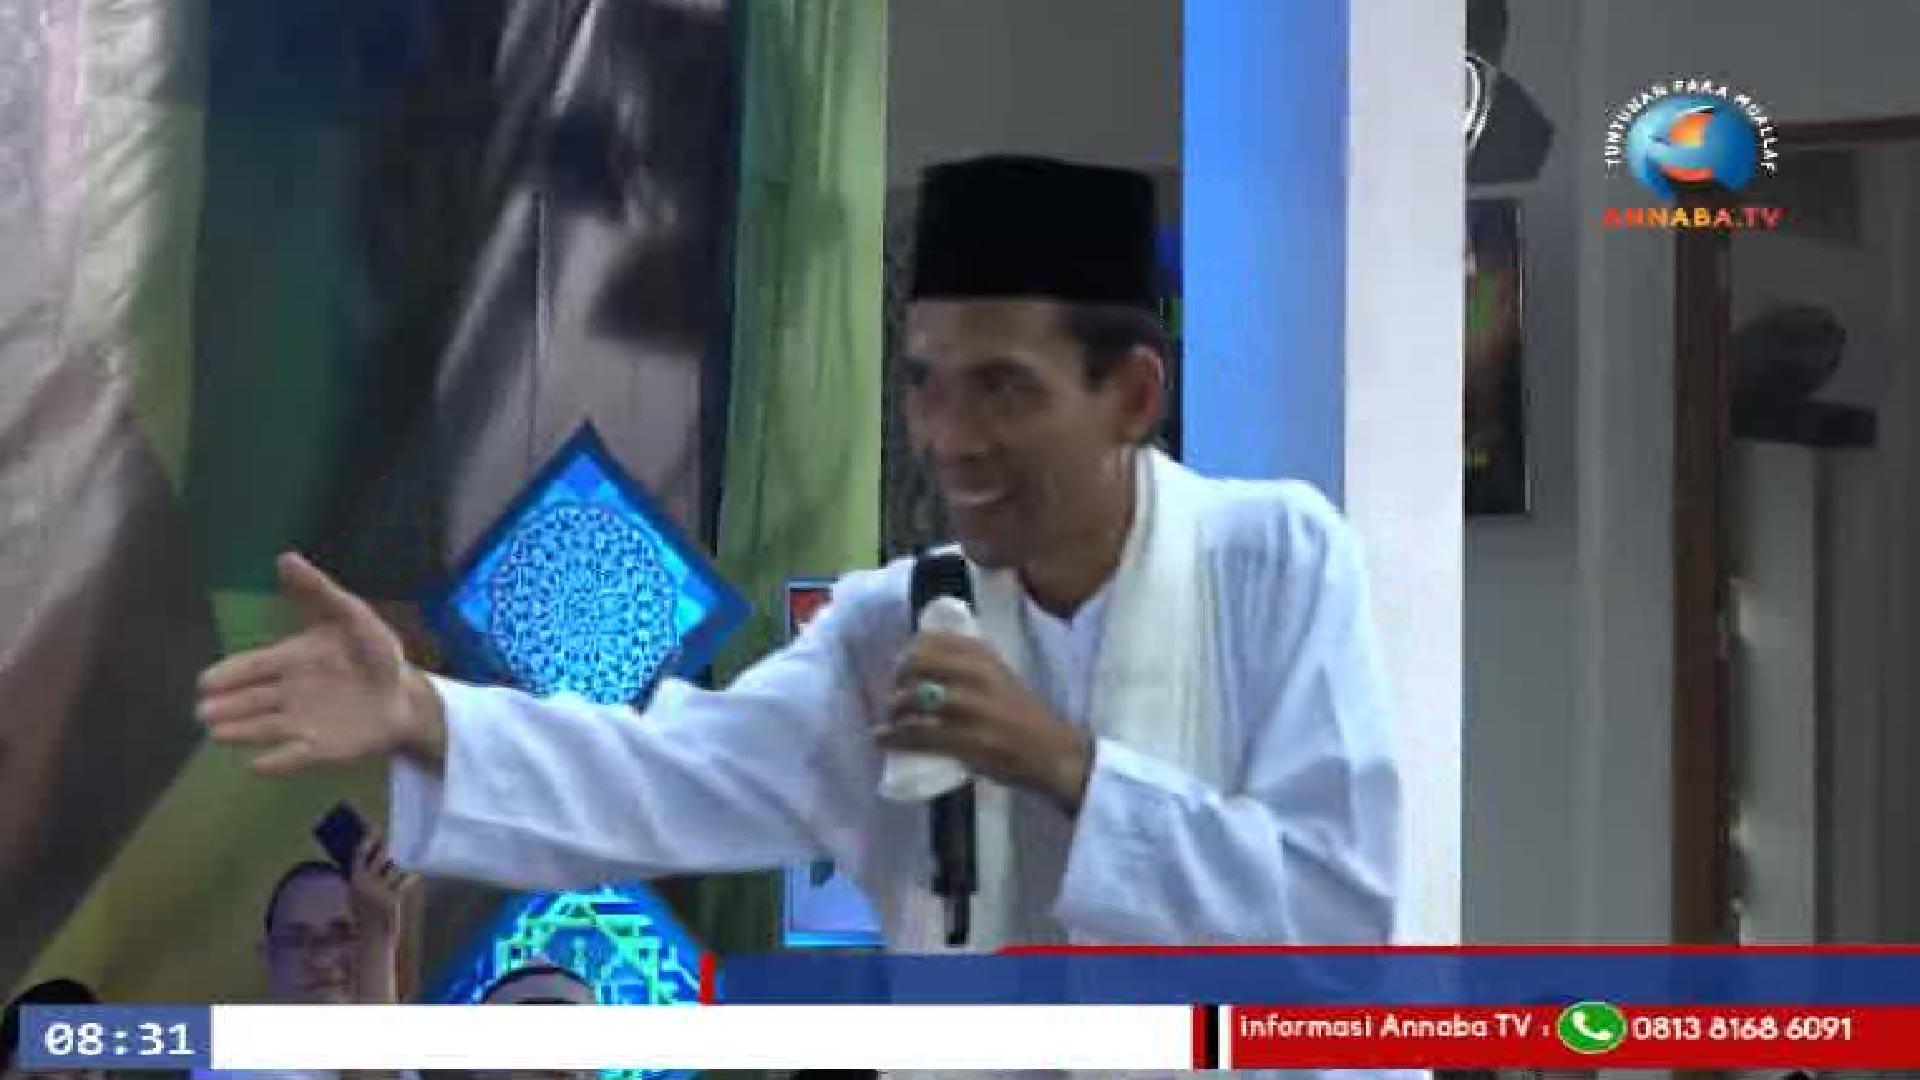 Frekuensi siaran Annaba TV di satelit Palapa D Terbaru